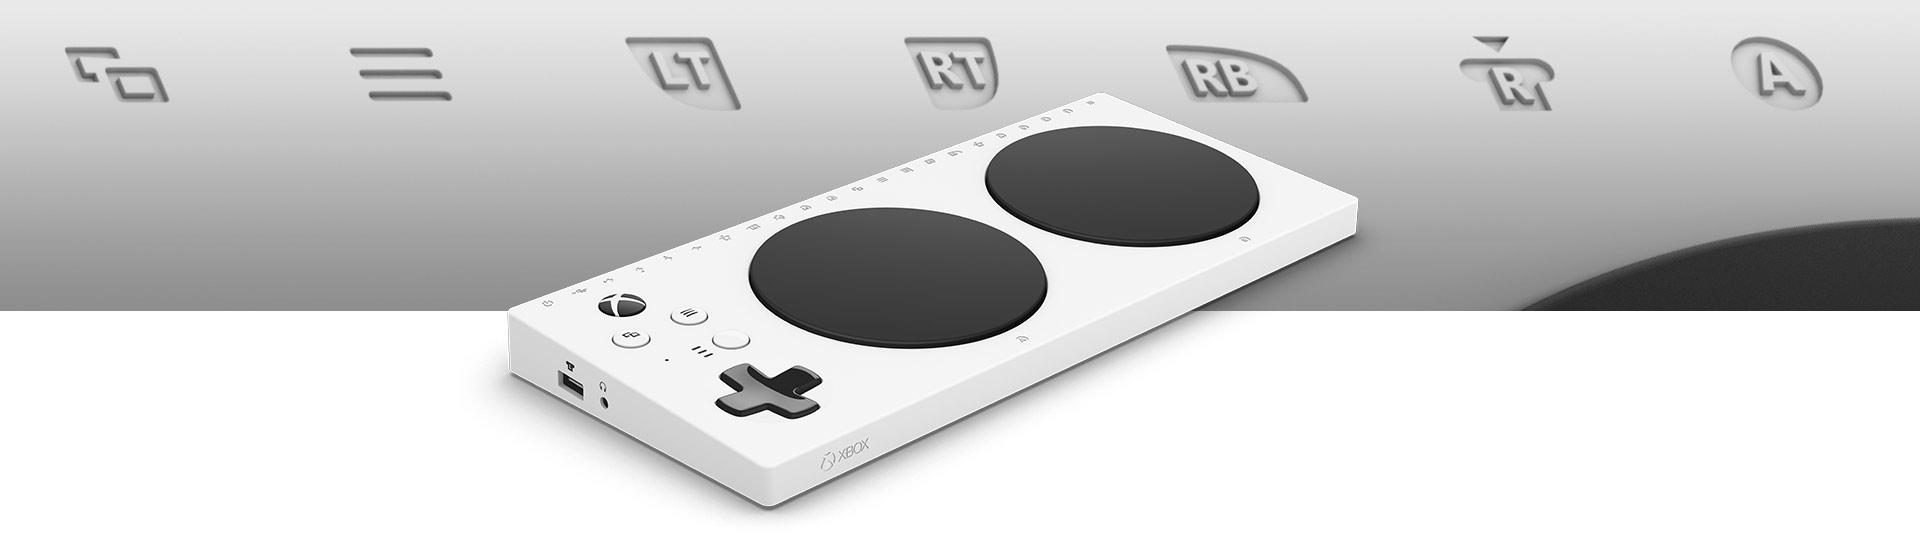 xbox adaptive controller [ 1920 x 540 Pixel ]